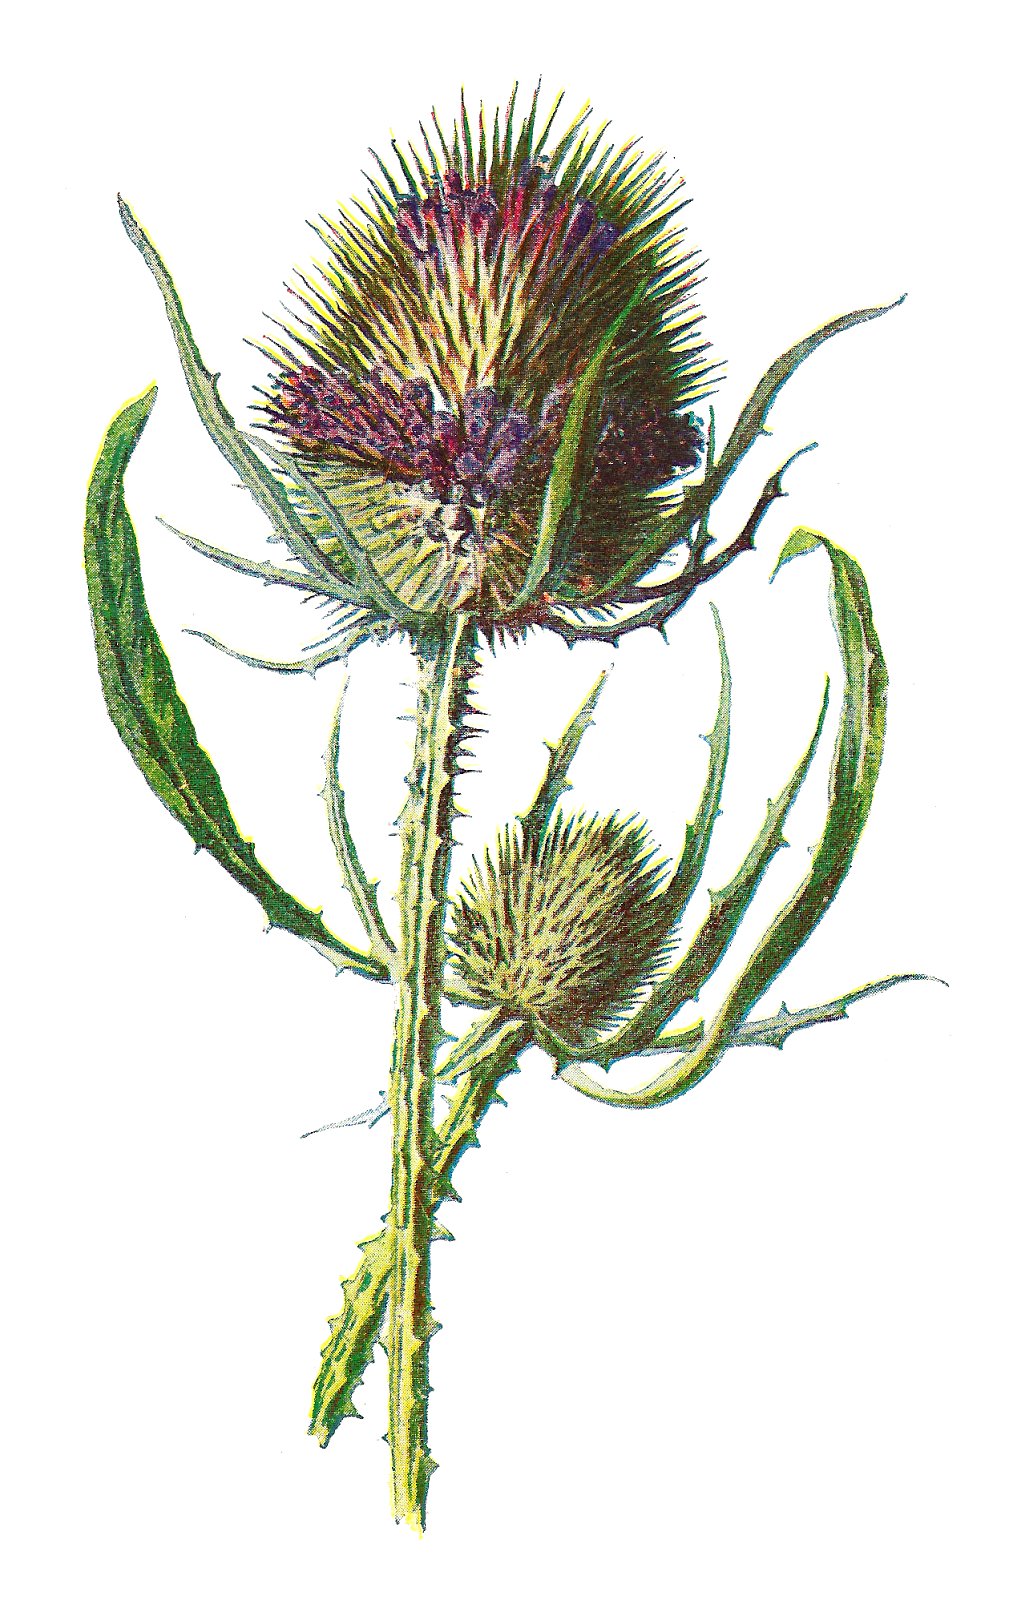 Antique Images: Free Digital Flower Clip Art: Wildflower Graphic.